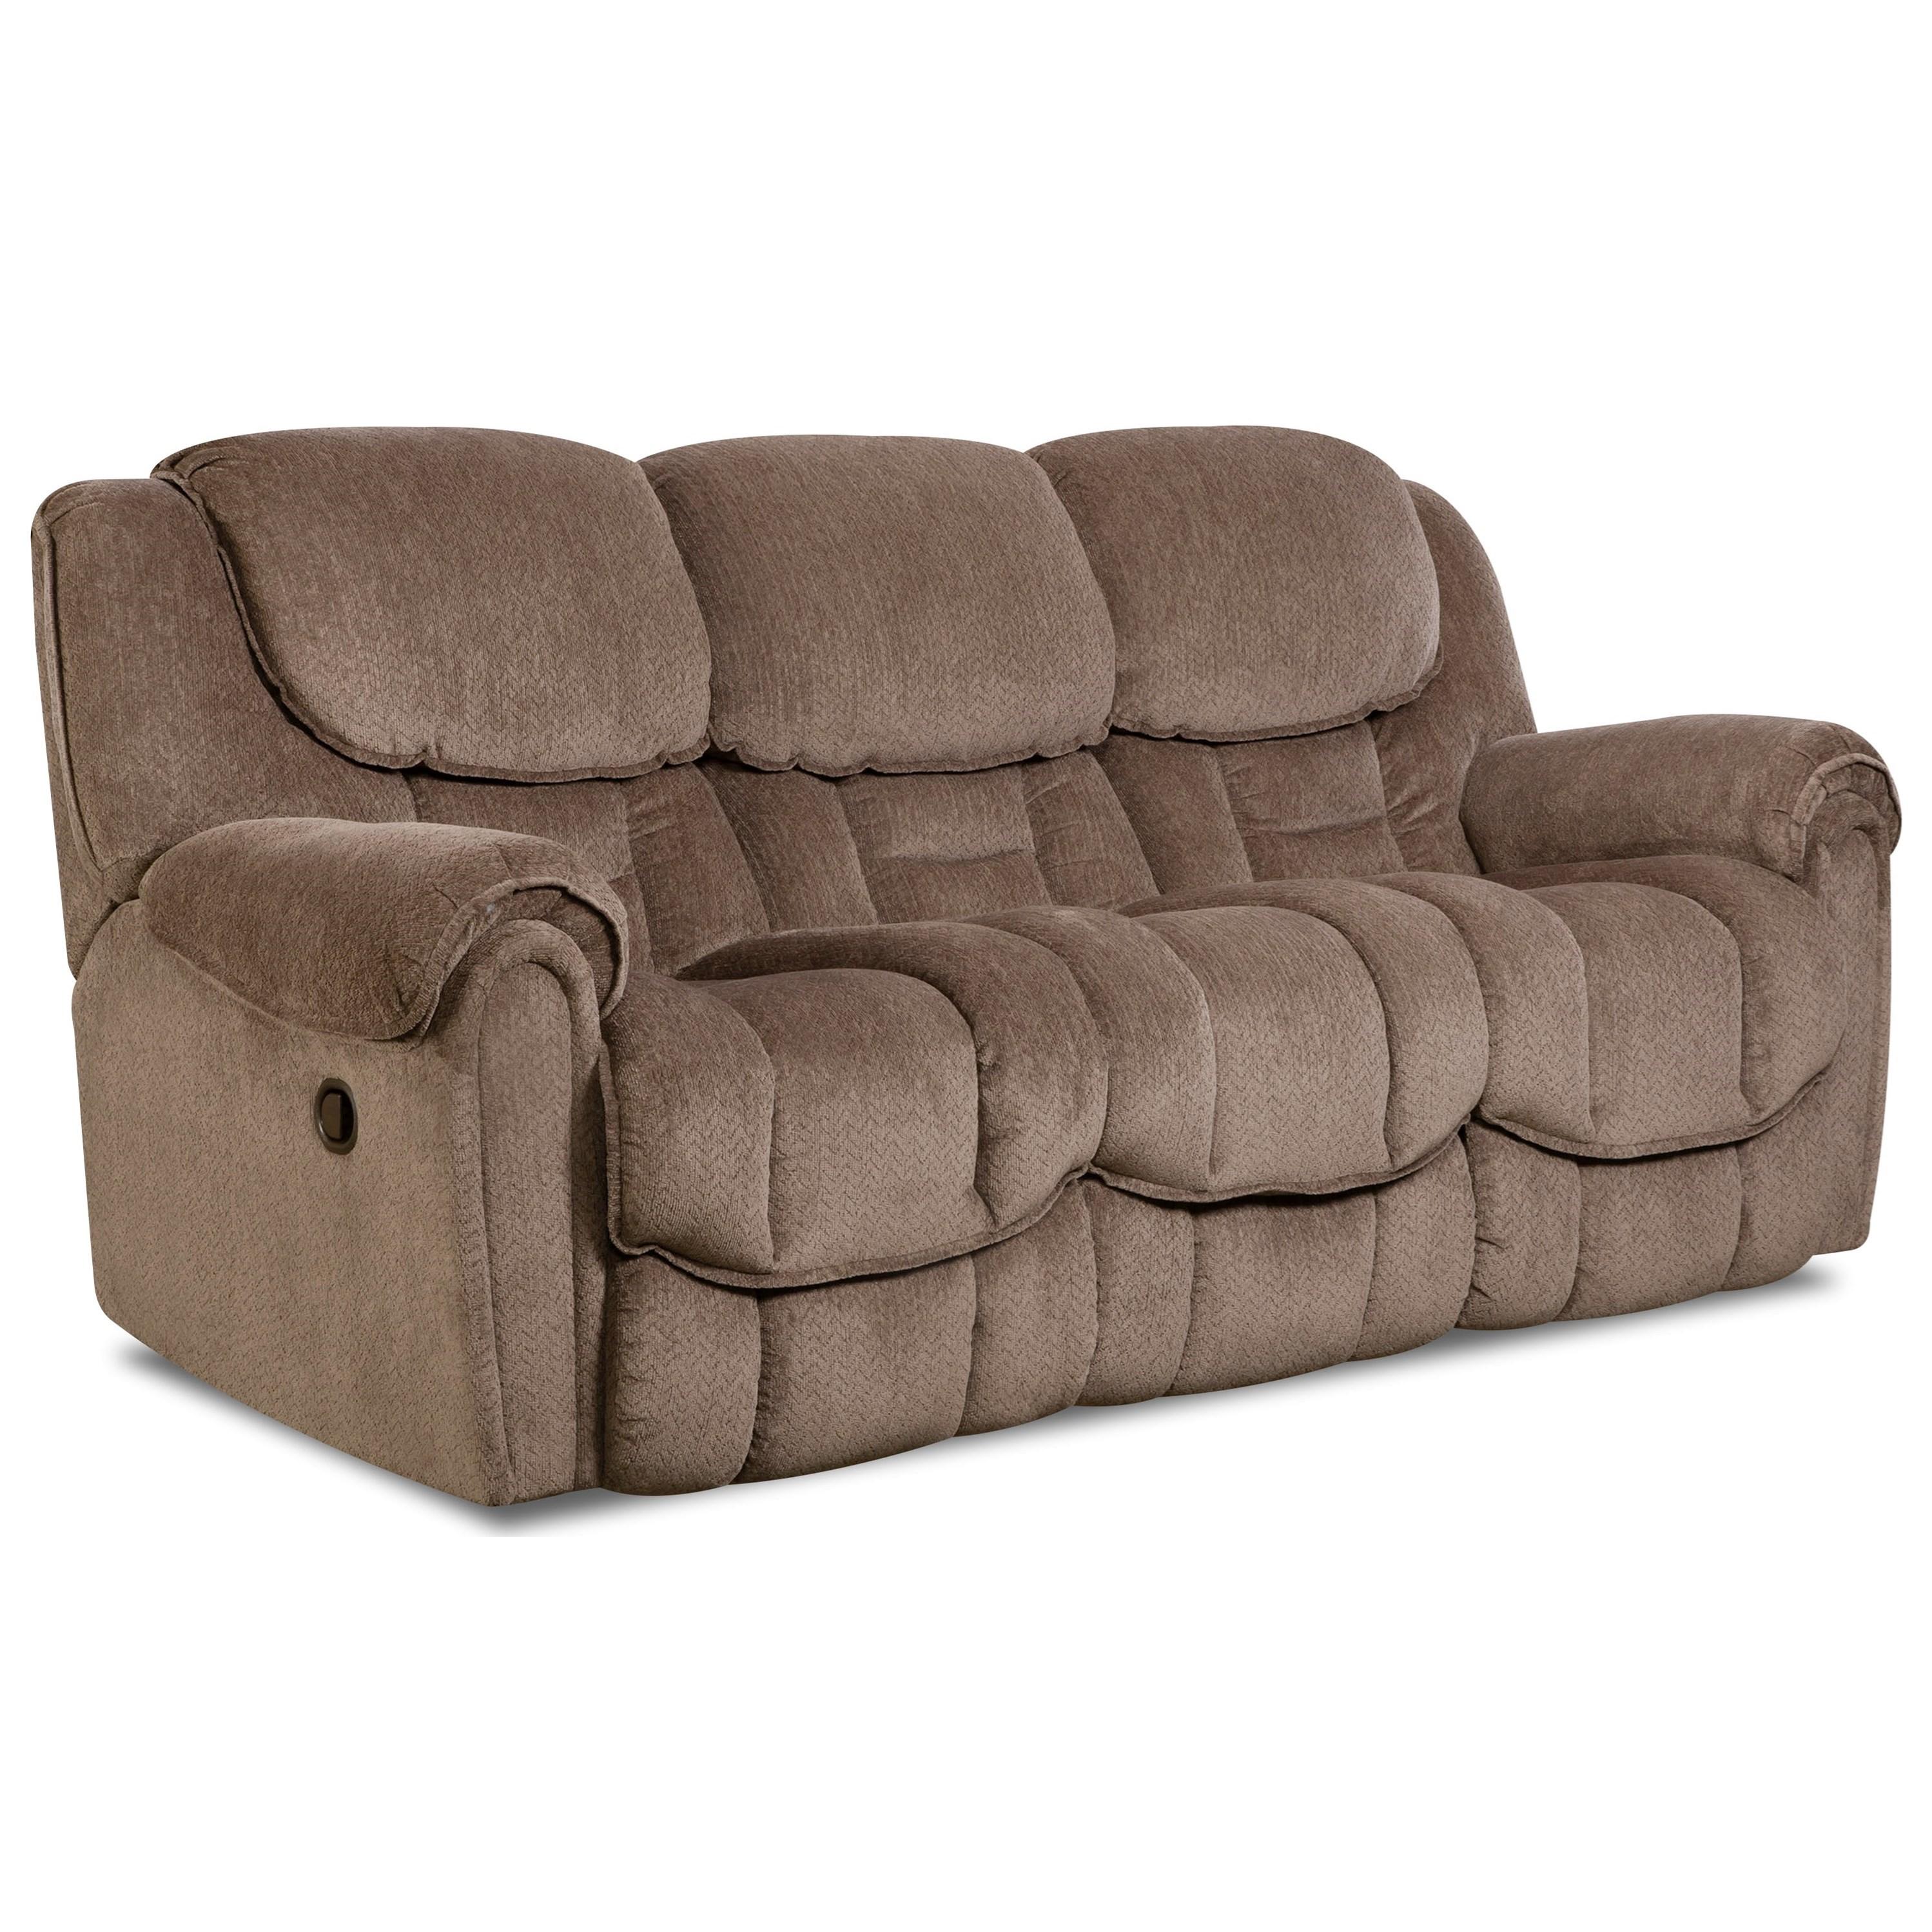 Del Mar 122 Double Reclining Sofa by HomeStretch at Johnny Janosik